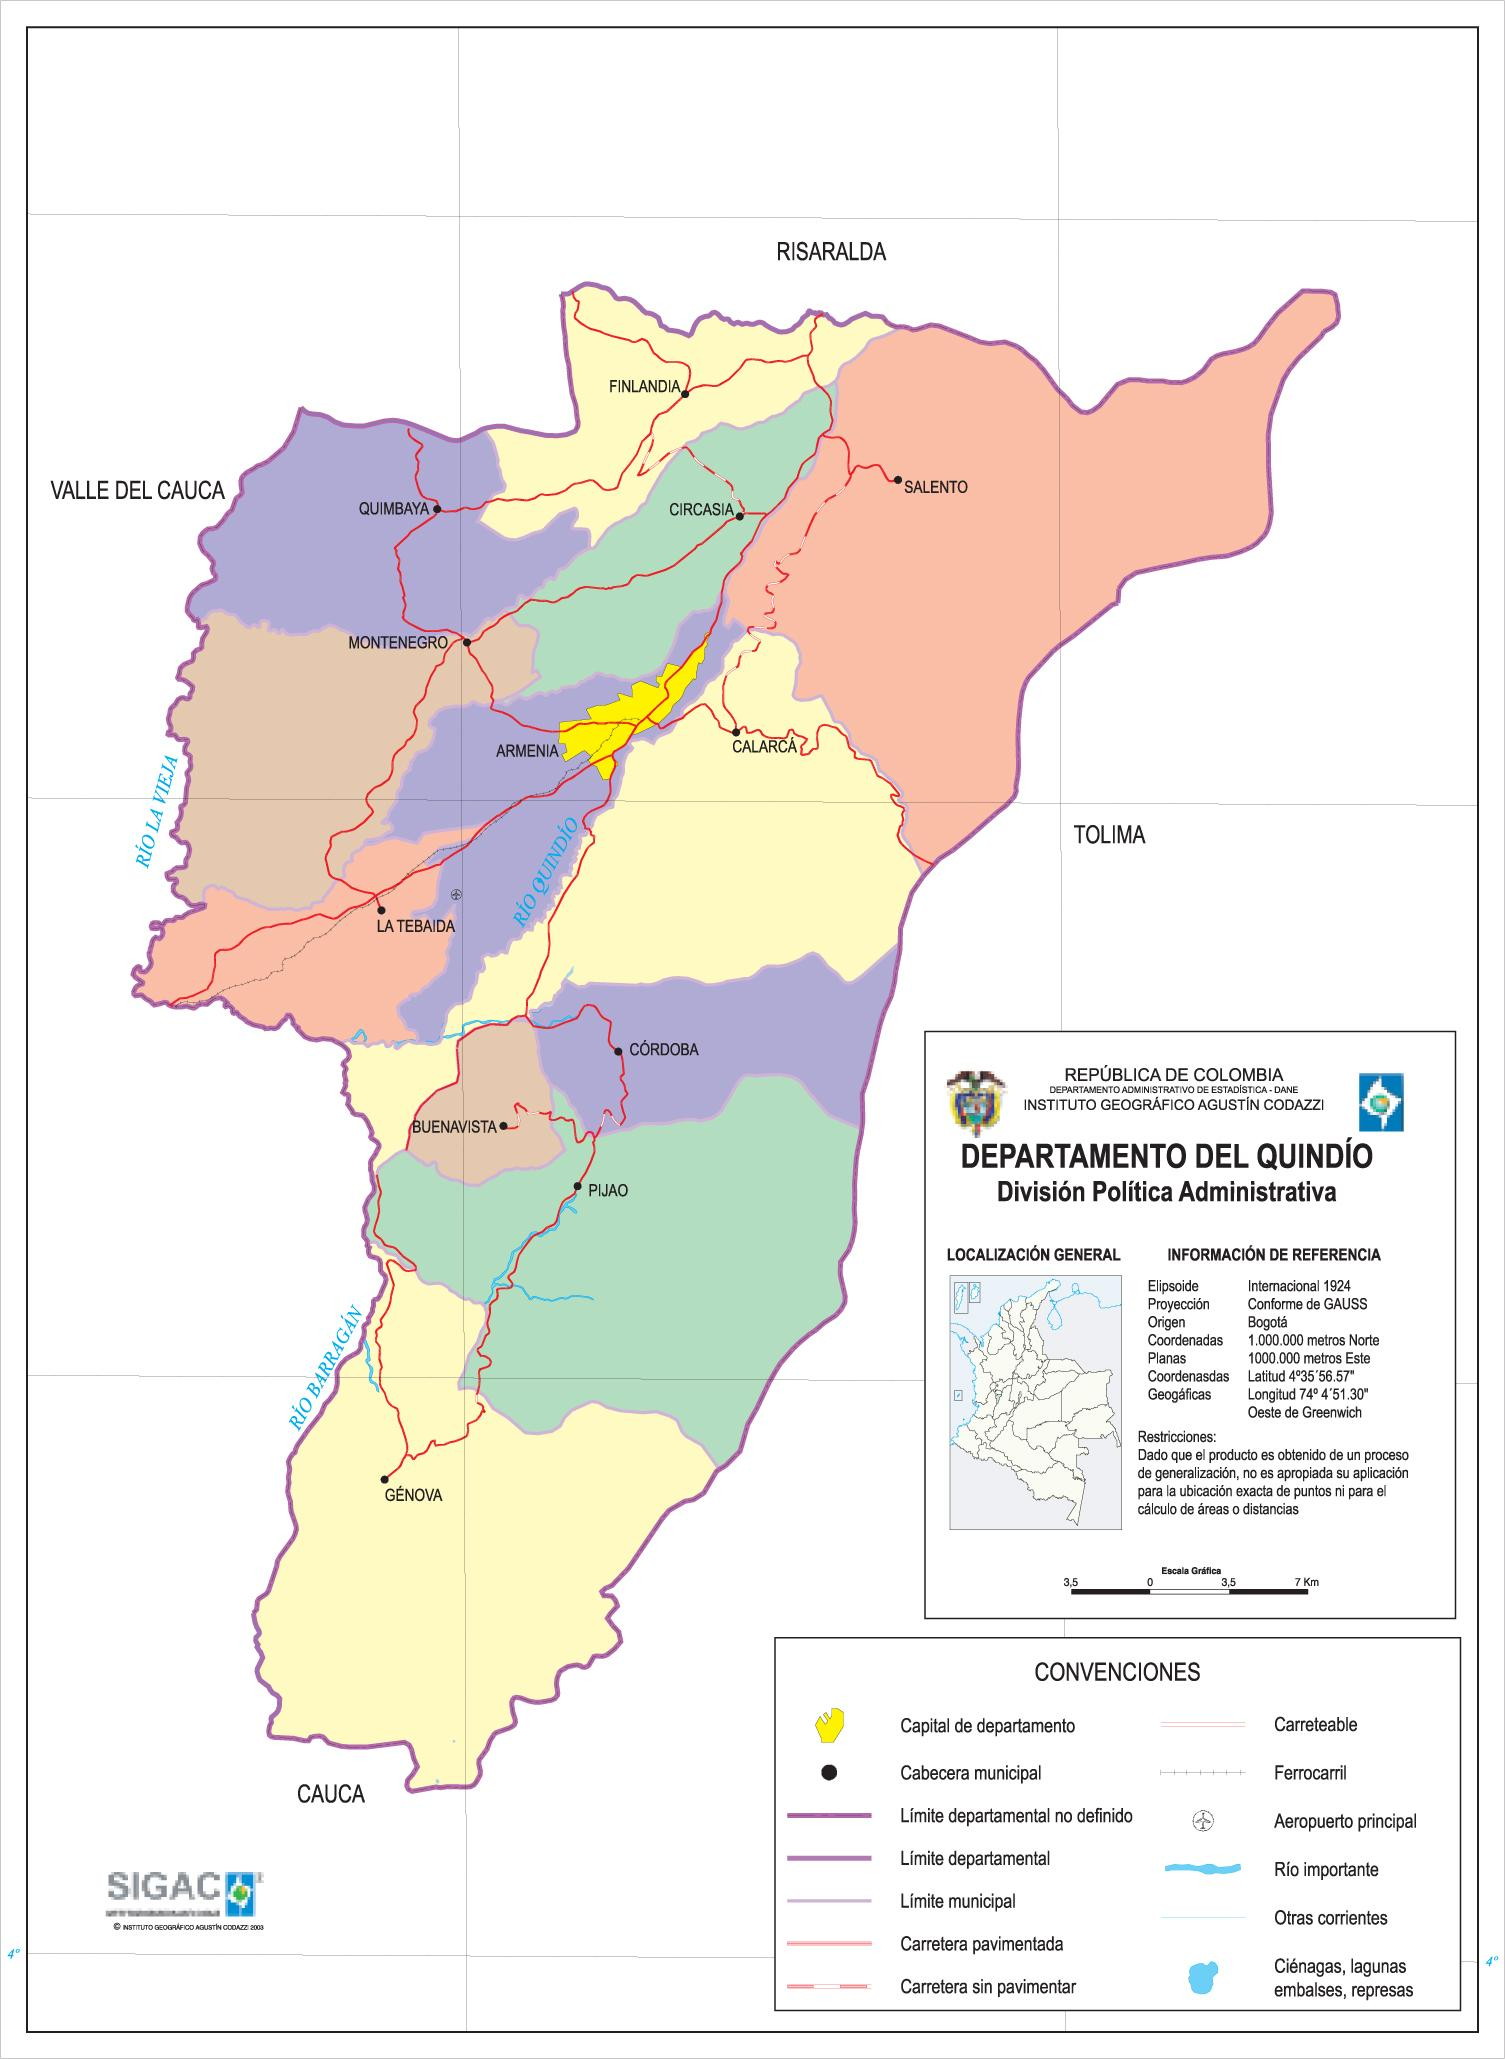 Mapa del Departamento del Quindio, Colombia